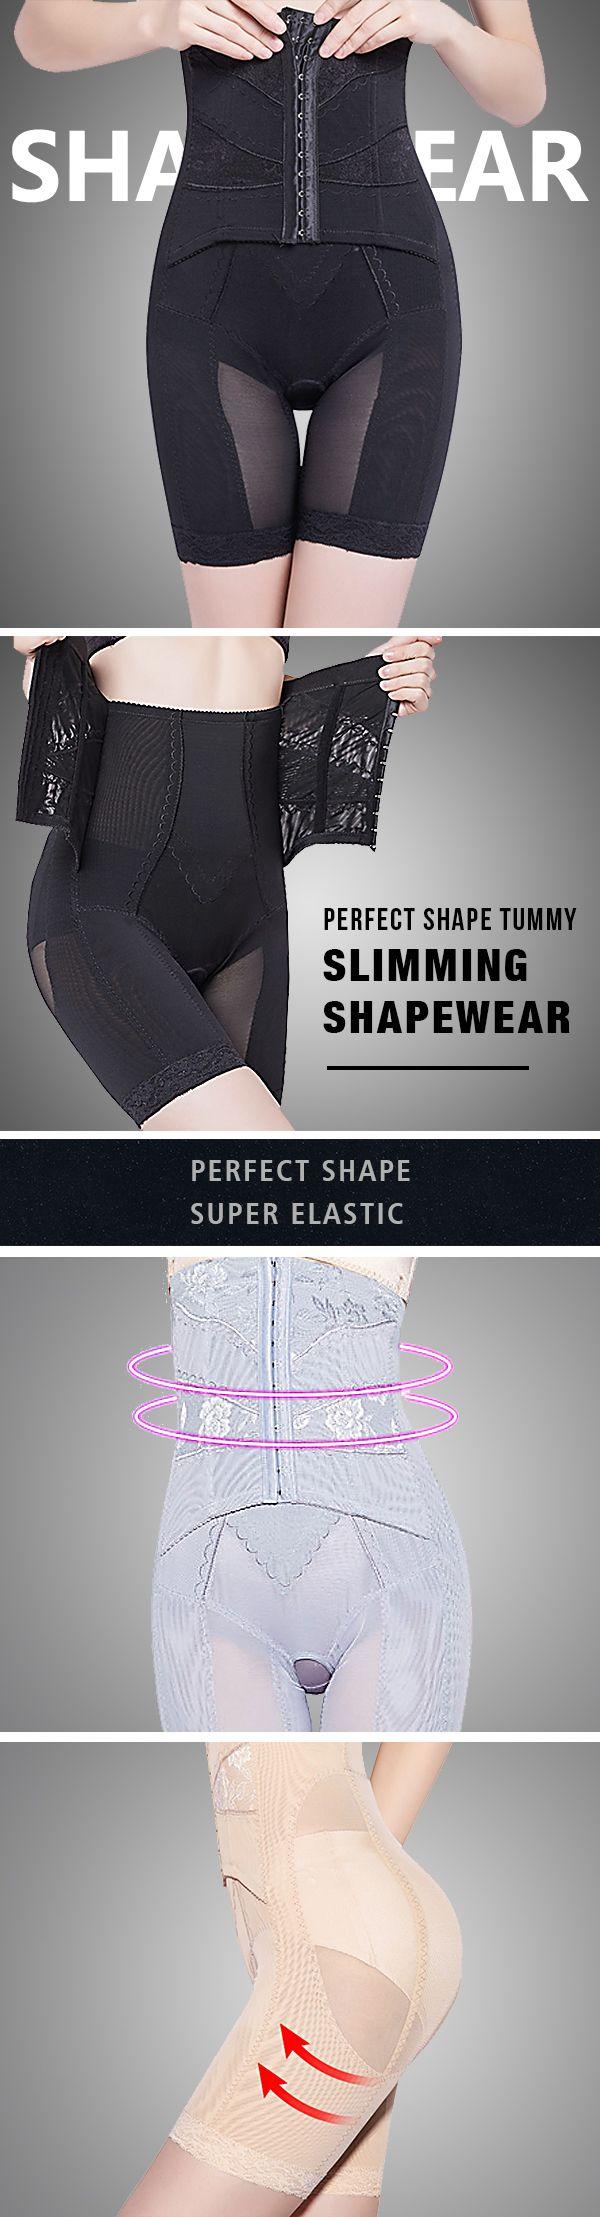 High Waisted Front Closure Perfect Shape Tummy Slimming Shapewear